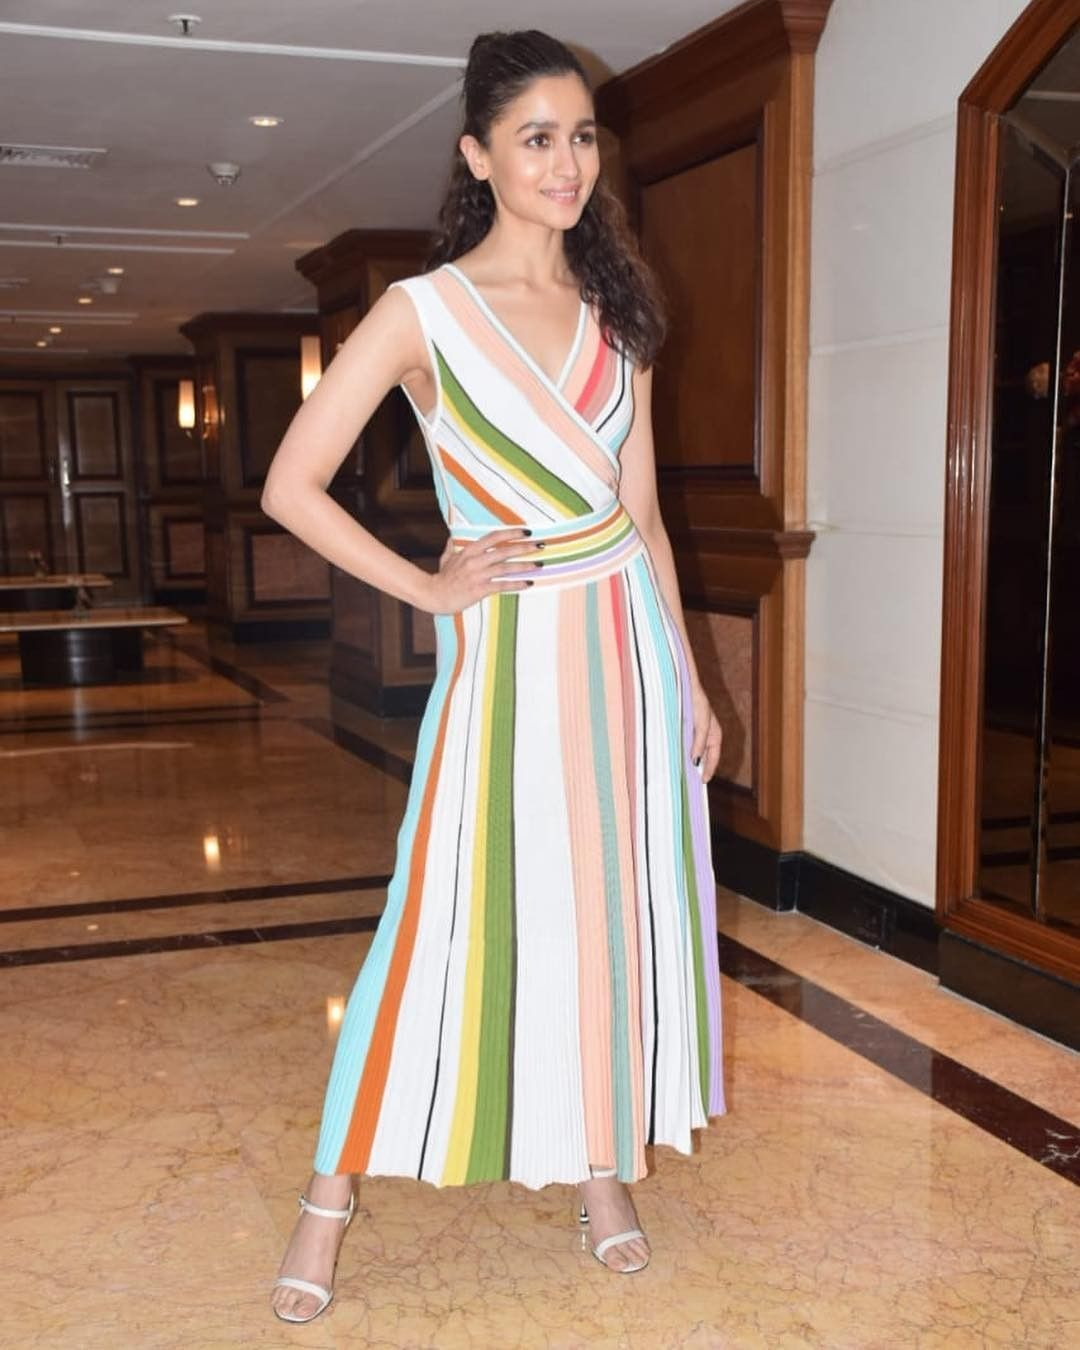 Alia Bhatt vs Karisma Kapoor: Who wore rainbow hued maxi dress better?